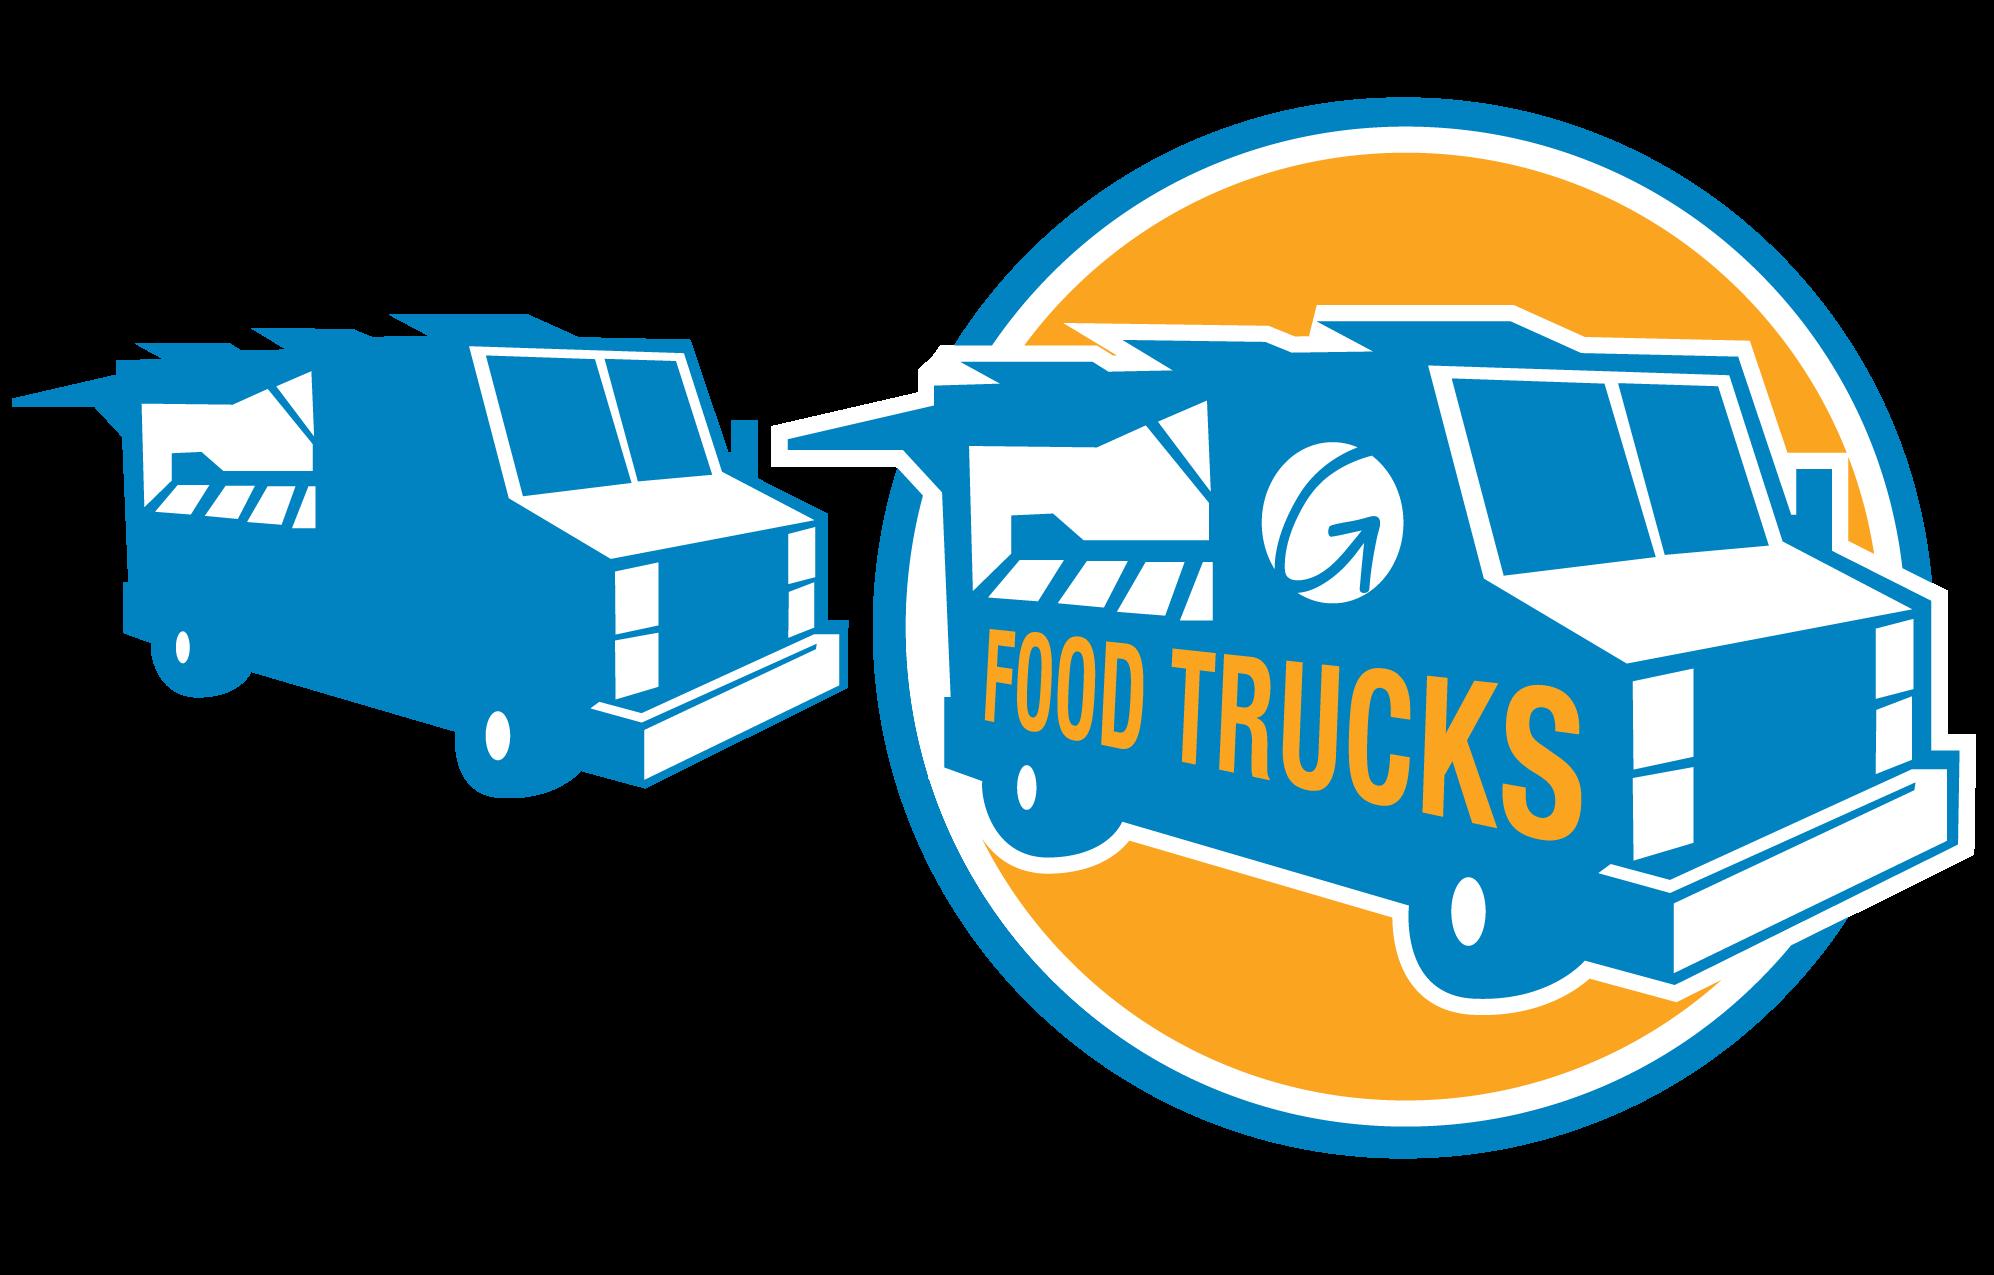 food-truck-plain-vector-01